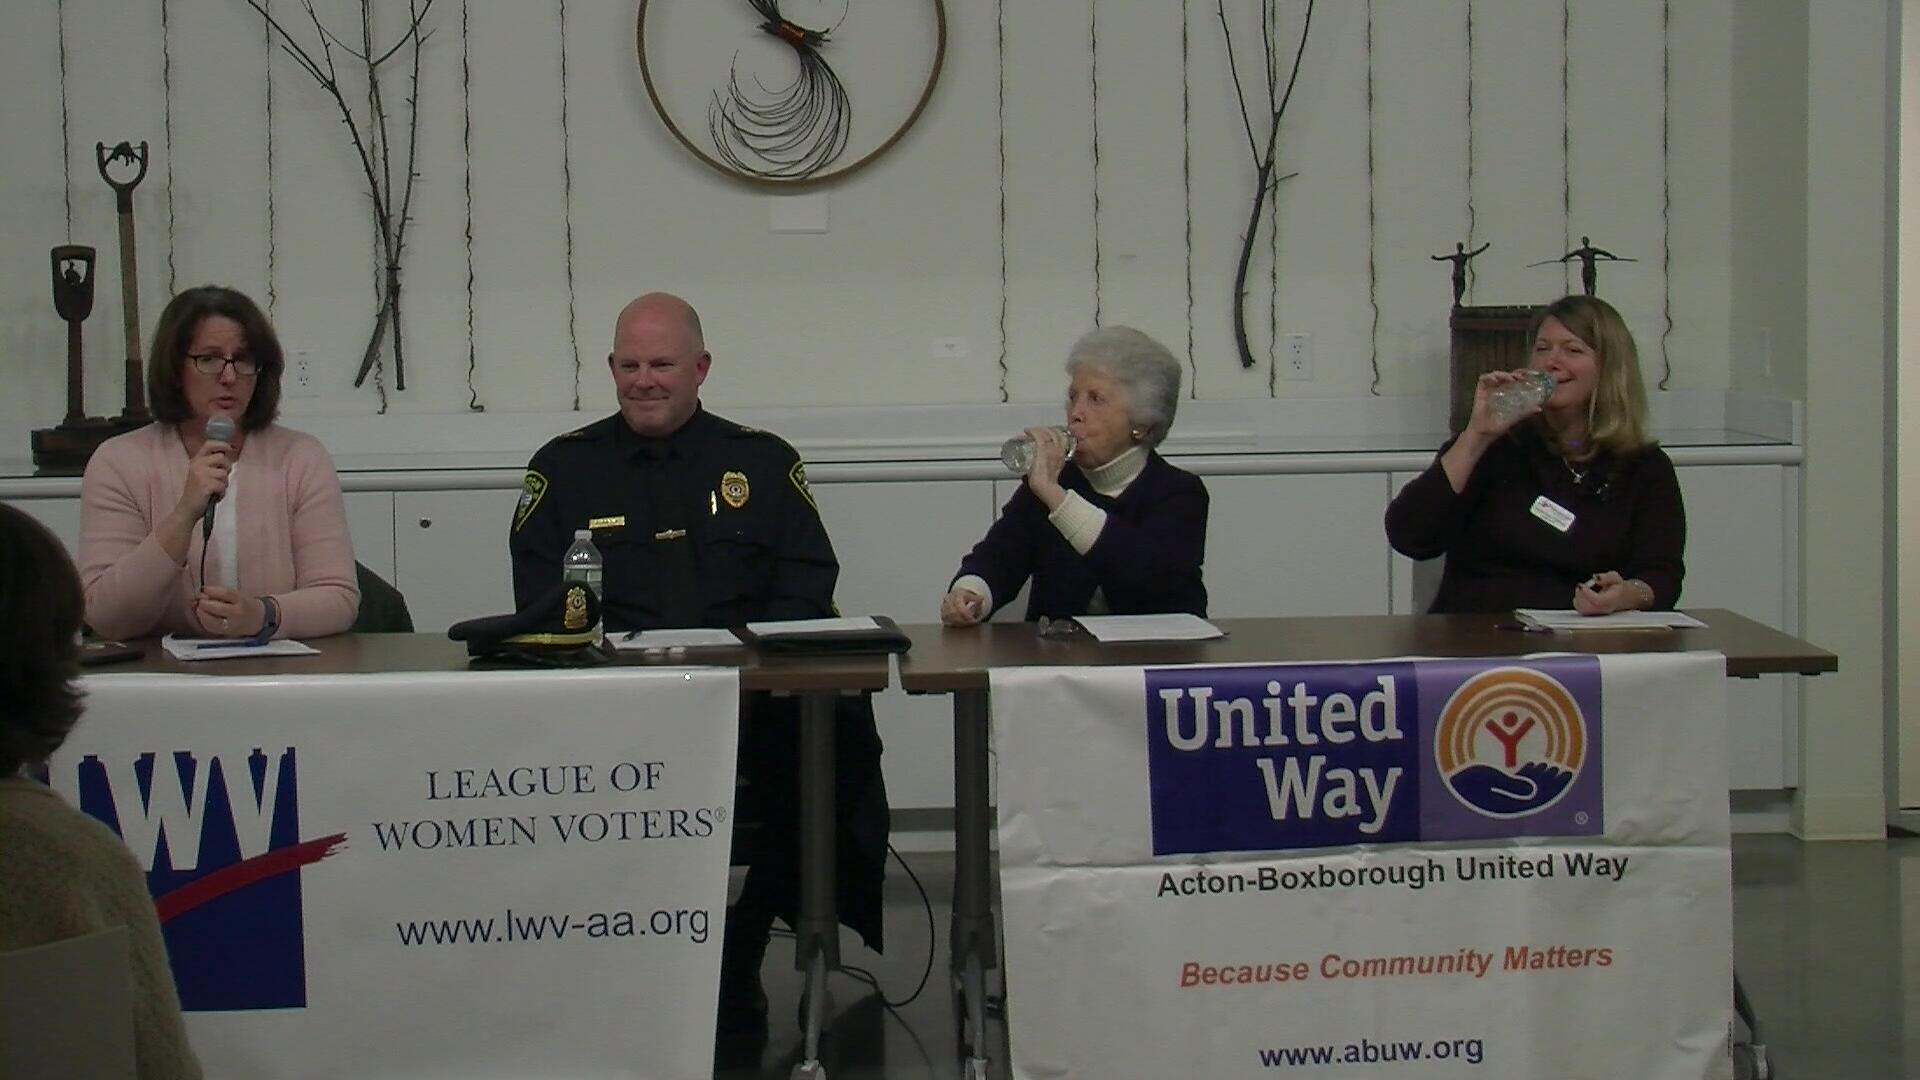 League of Women Voters United Way Seniors Caregiving Panel 1∕17∕17